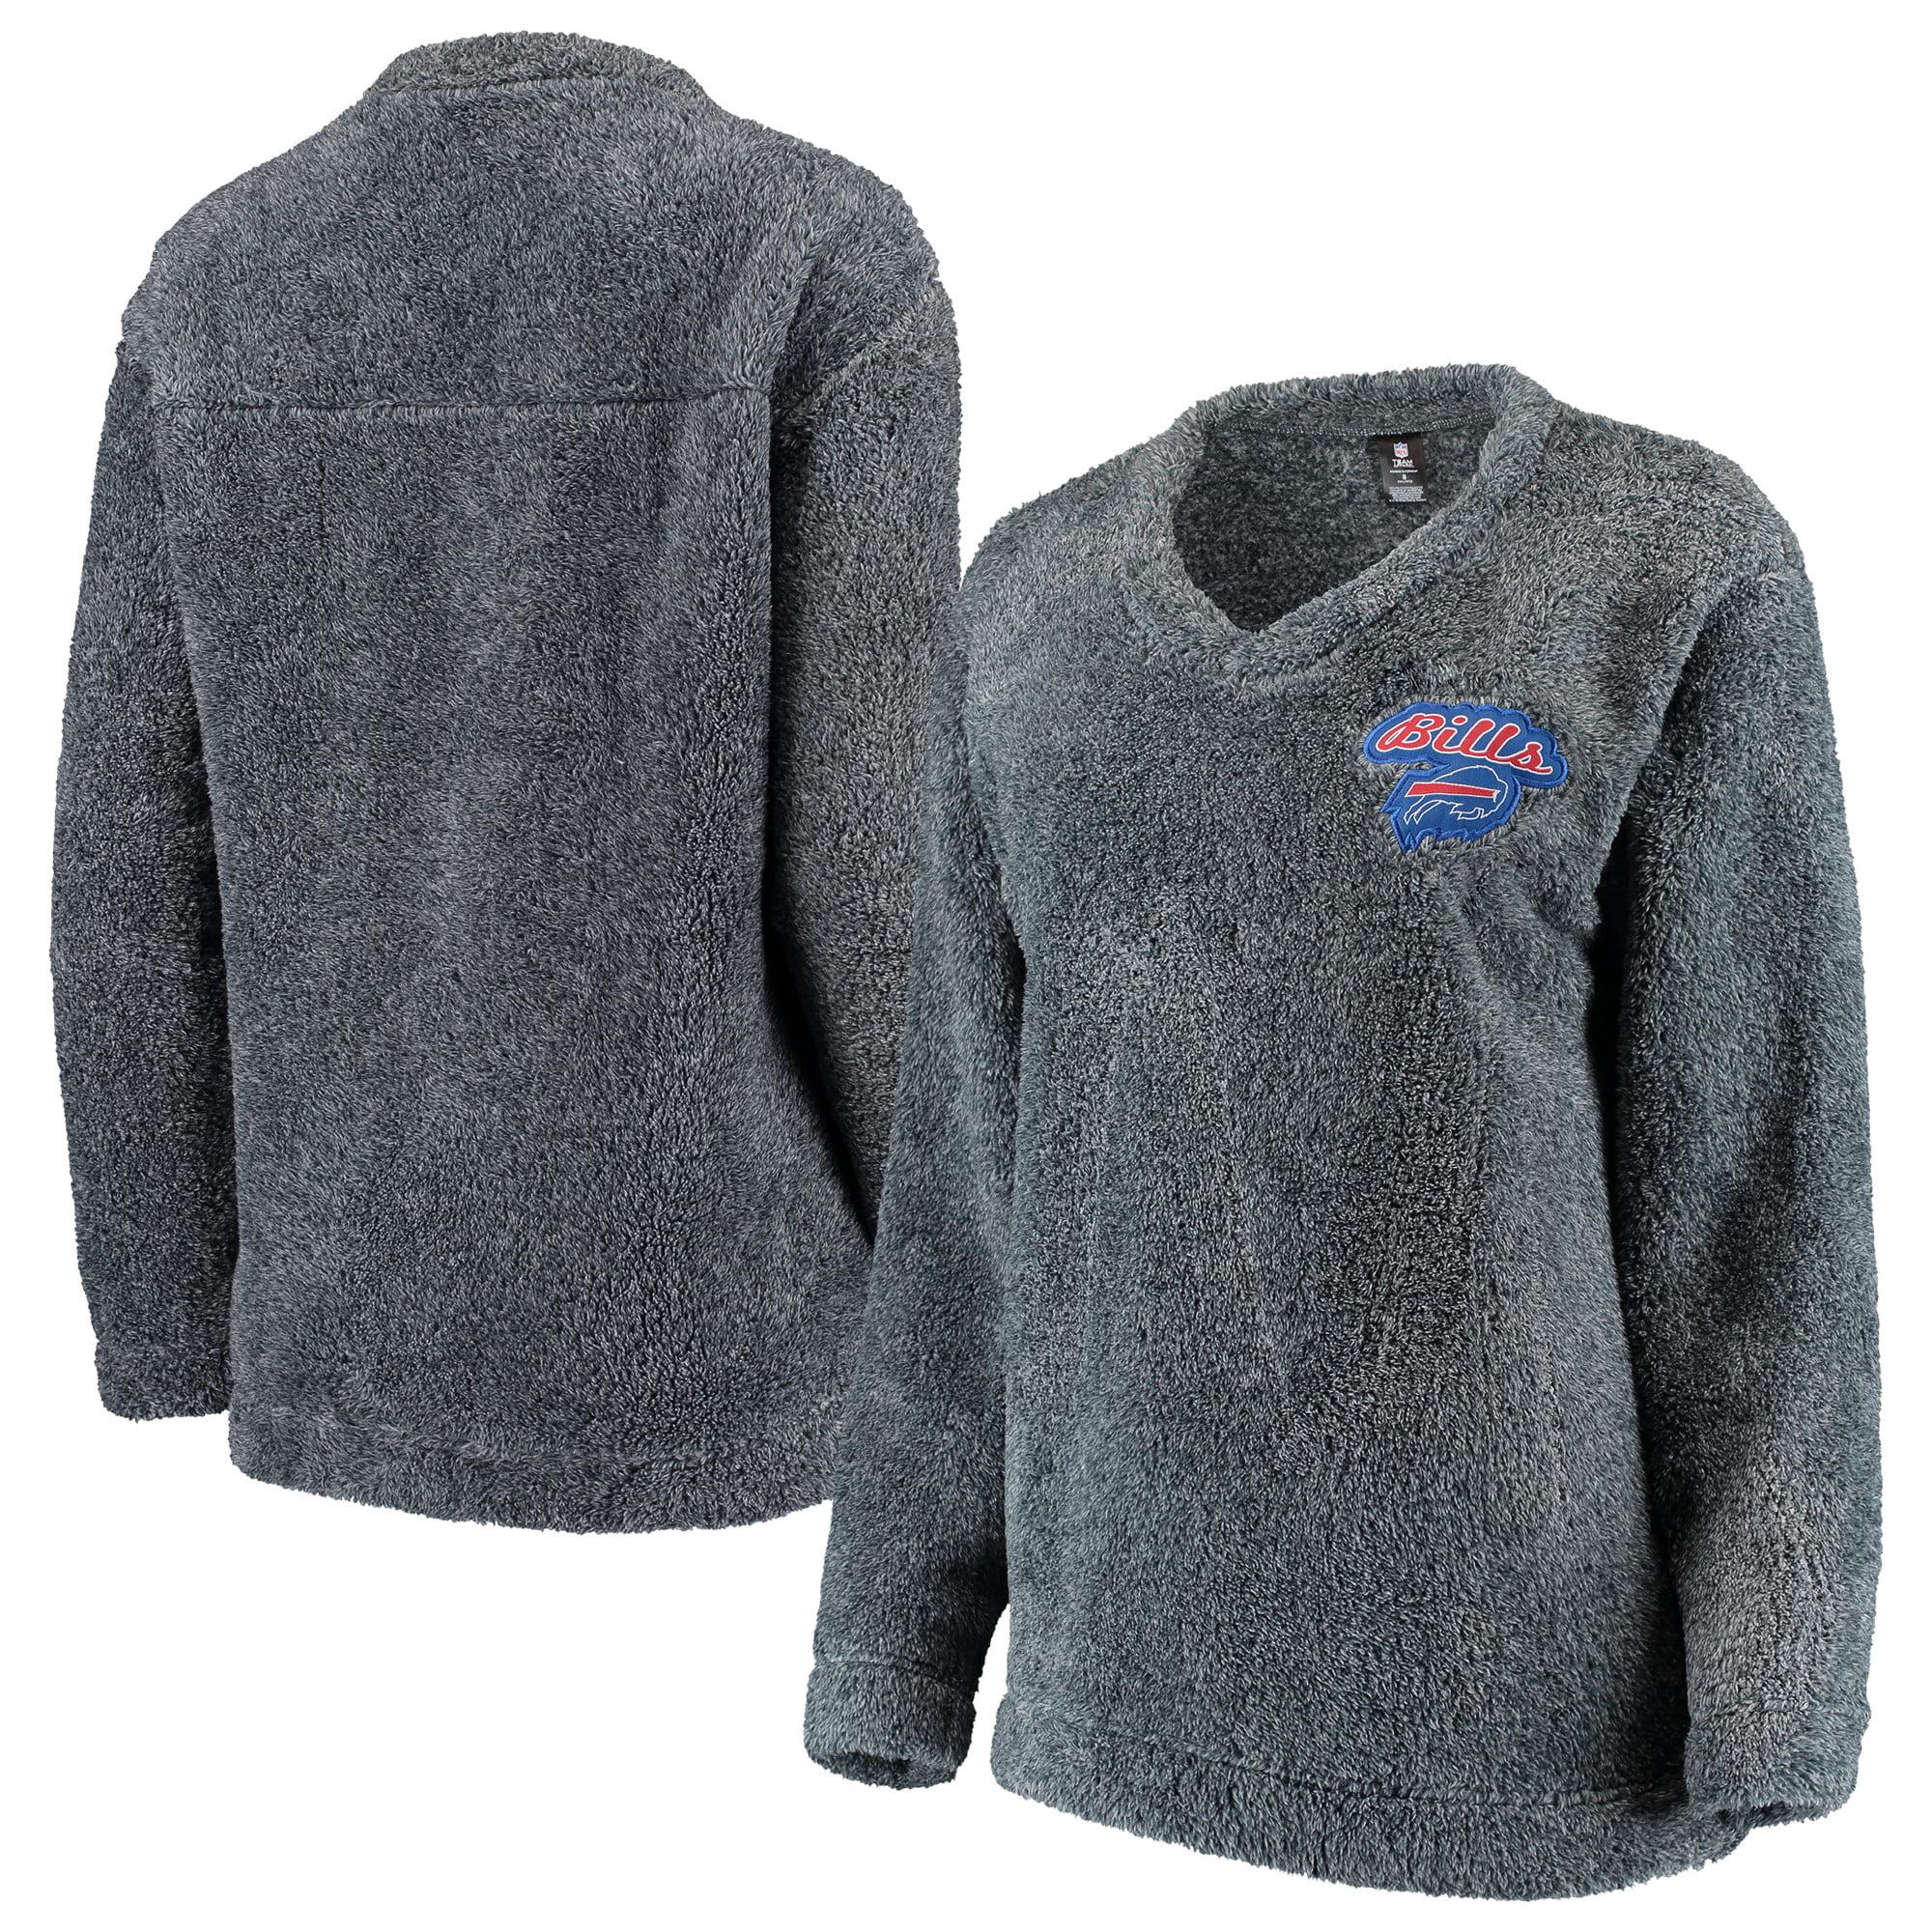 Buffalo Bills Concepts Sport Women's Trifecta Pullover Sweatshirt - Charcoal